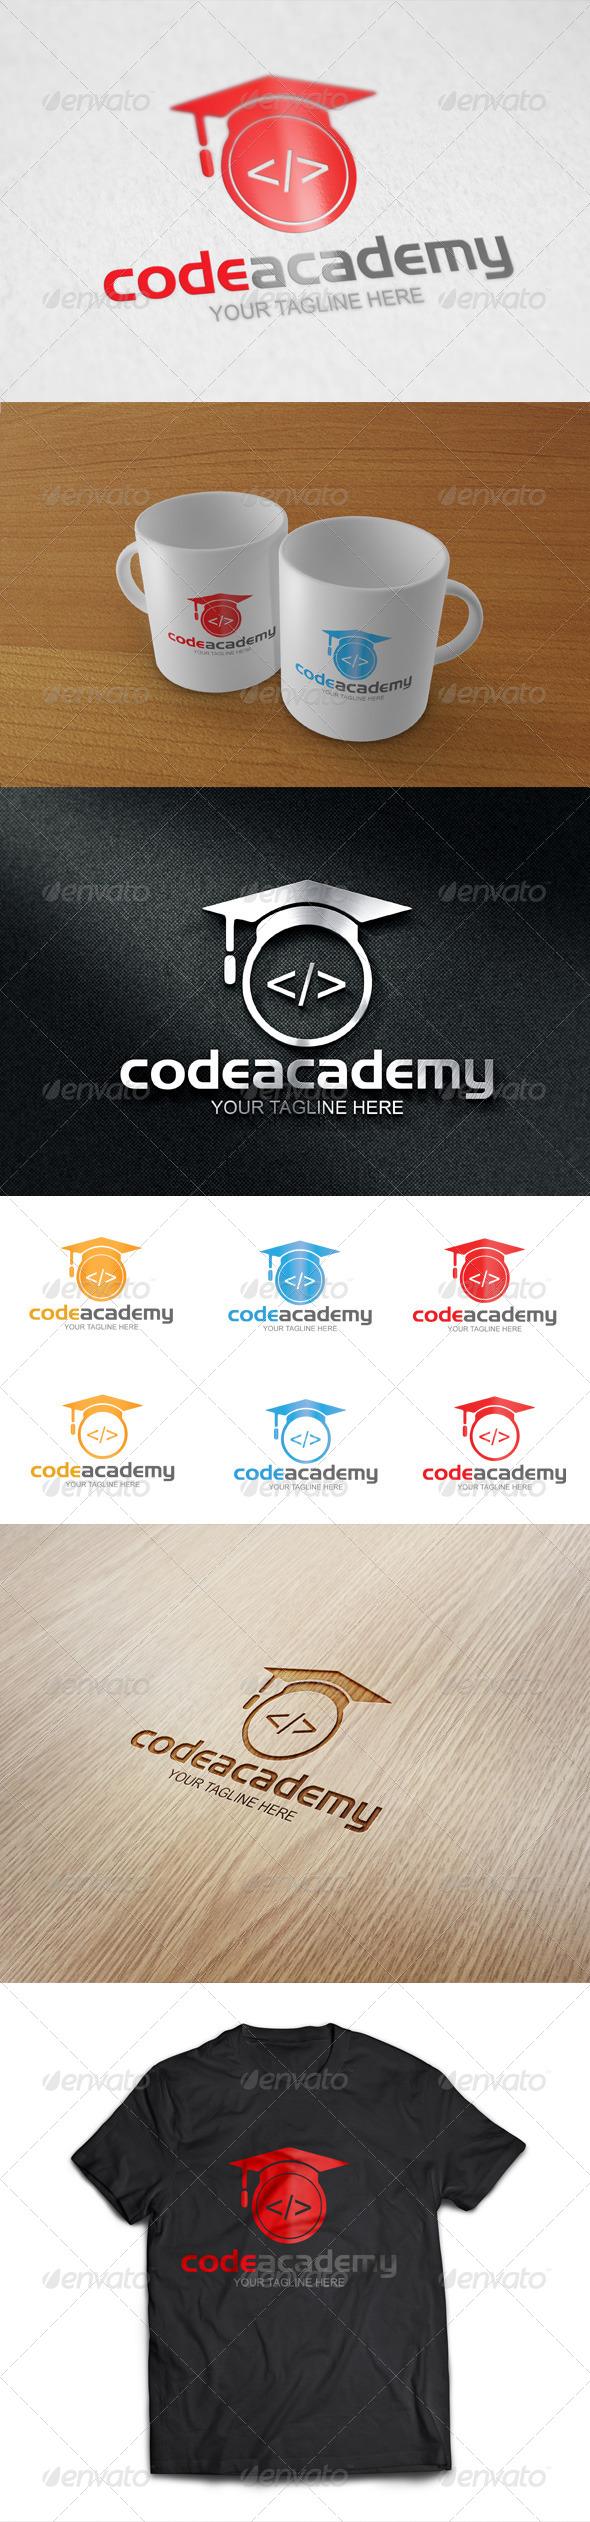 Code Academy Logo Template